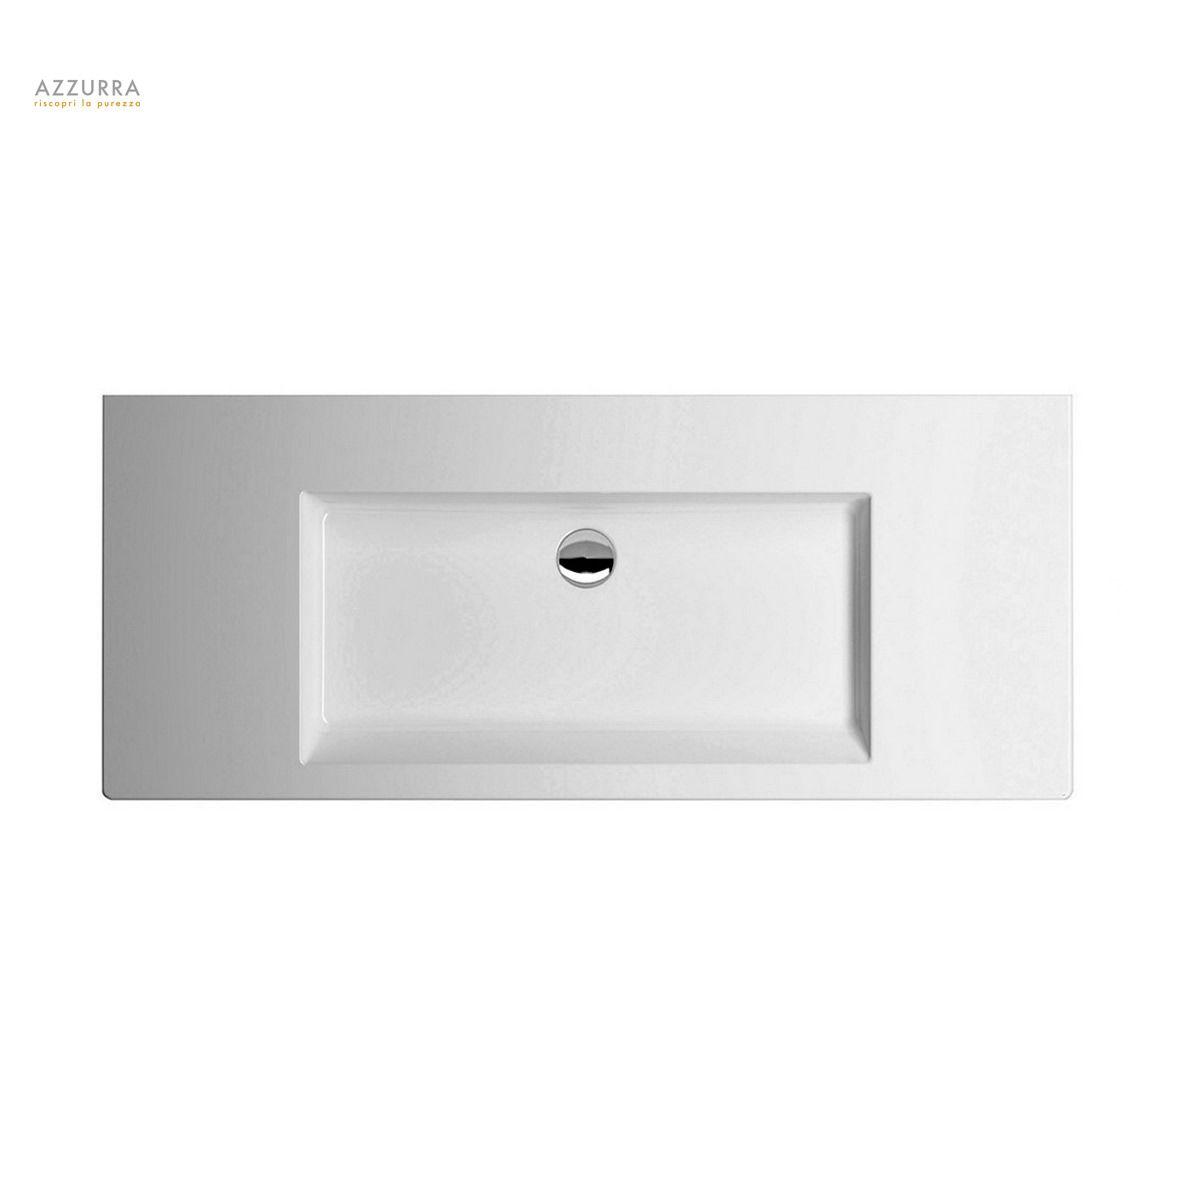 Azzurra Thin Square Wall Hung Basin : UK Bathrooms